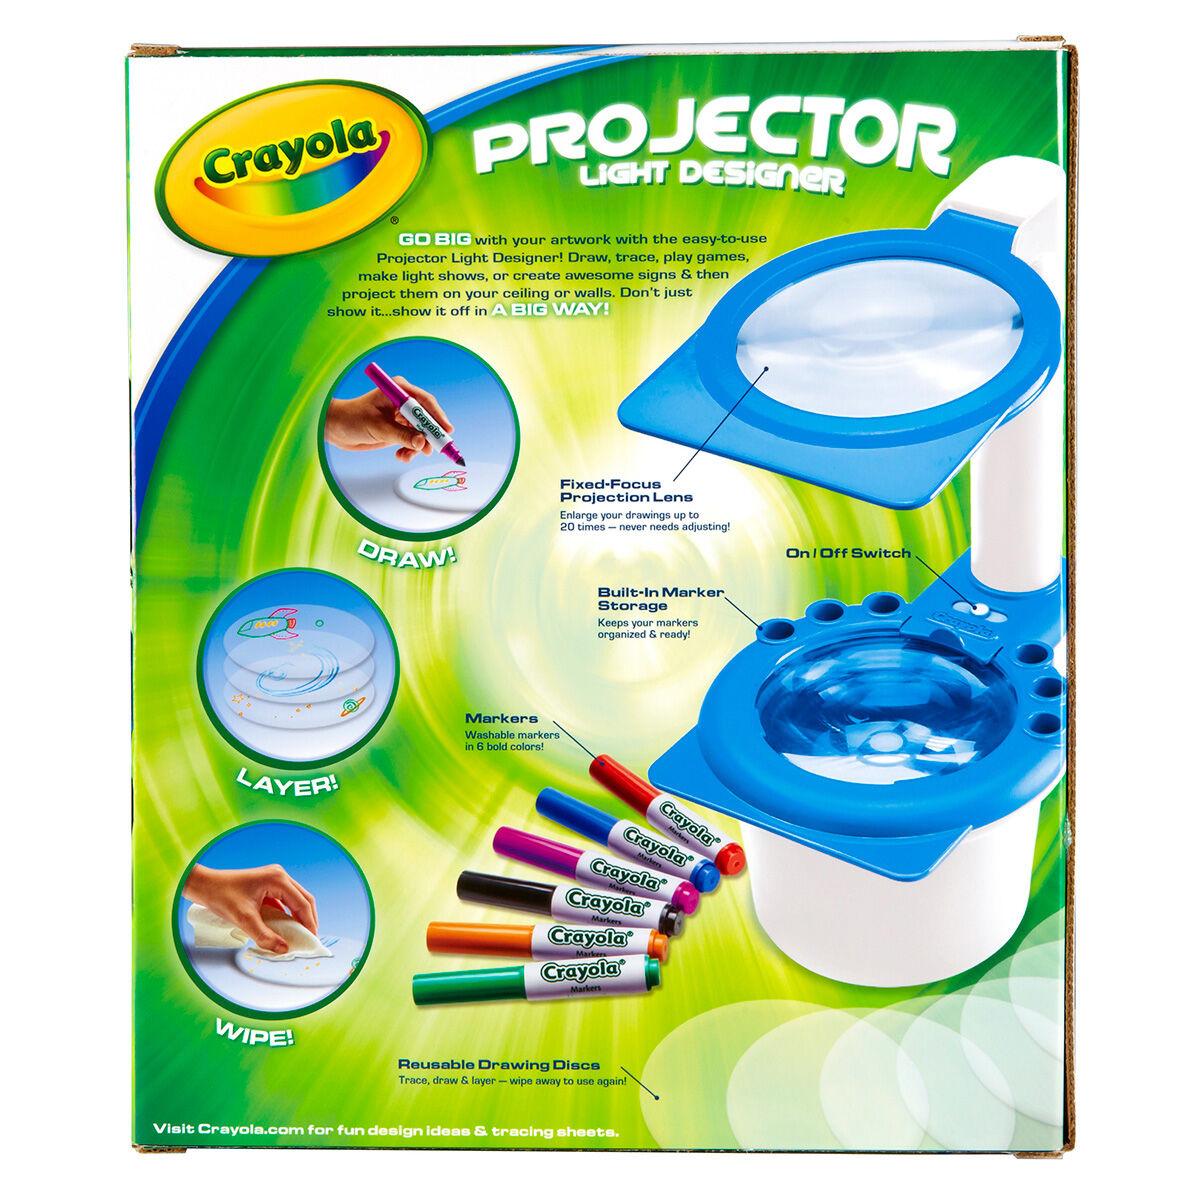 Crayola Projector Light Designer Light Projector Crayola